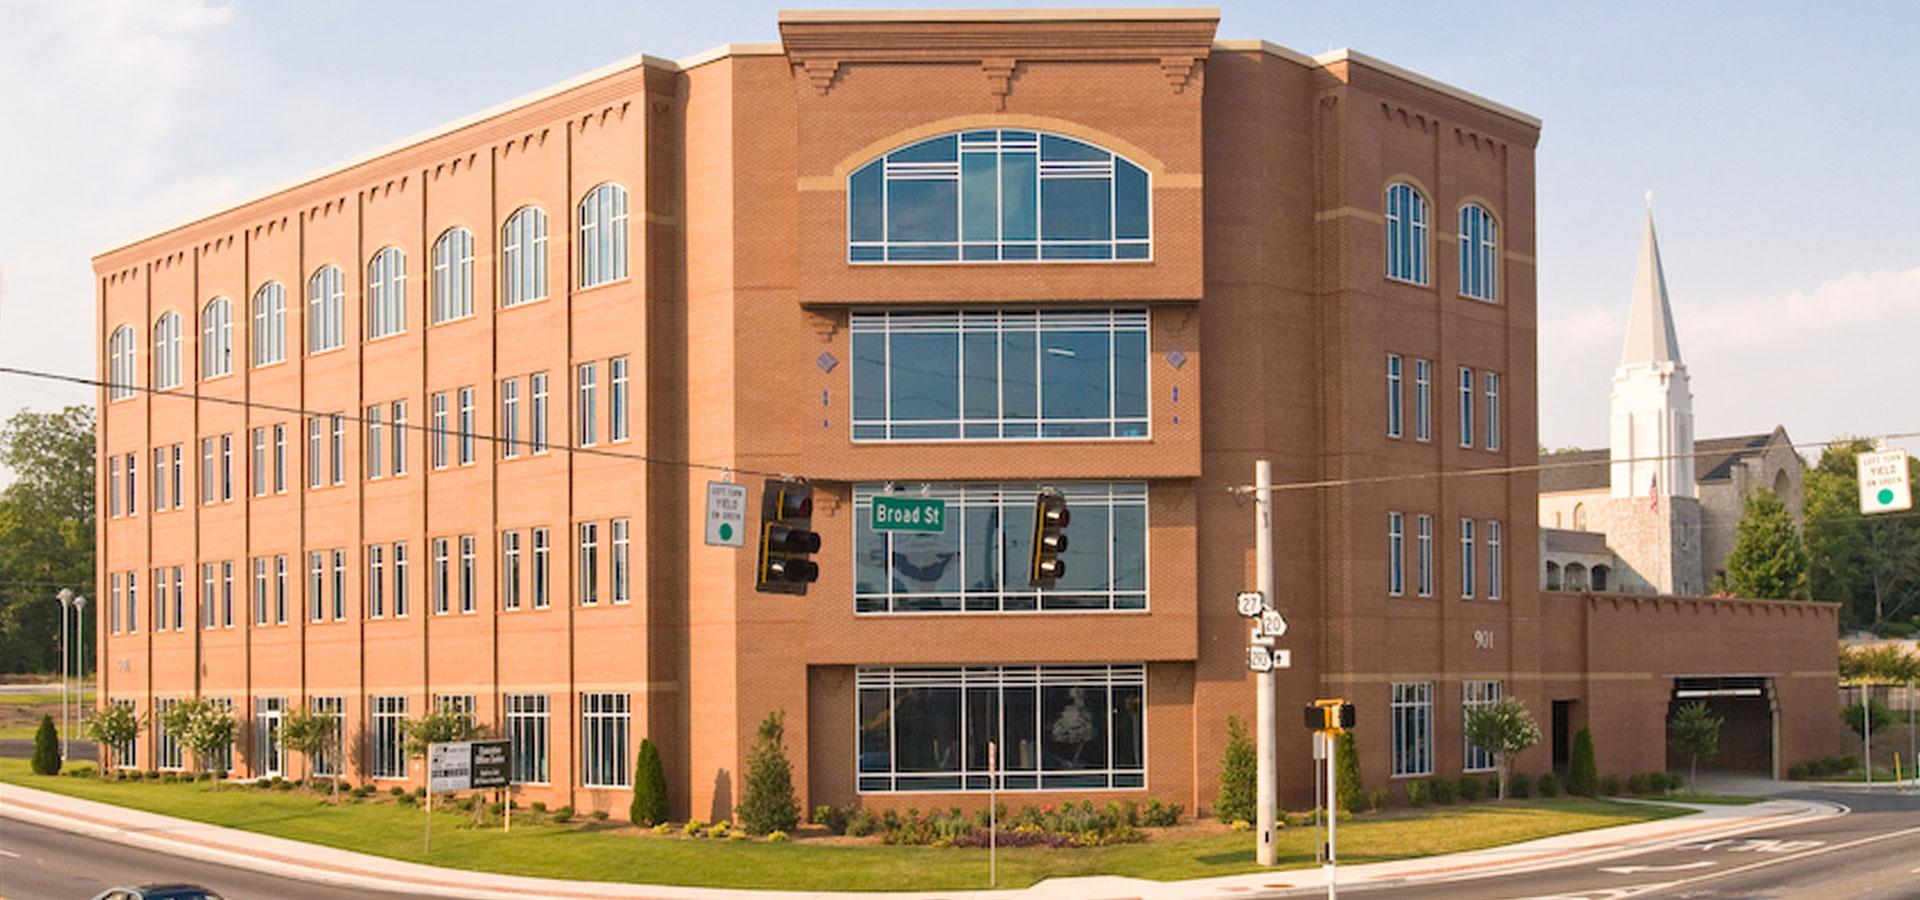 901-Broad-St-DLS-Building